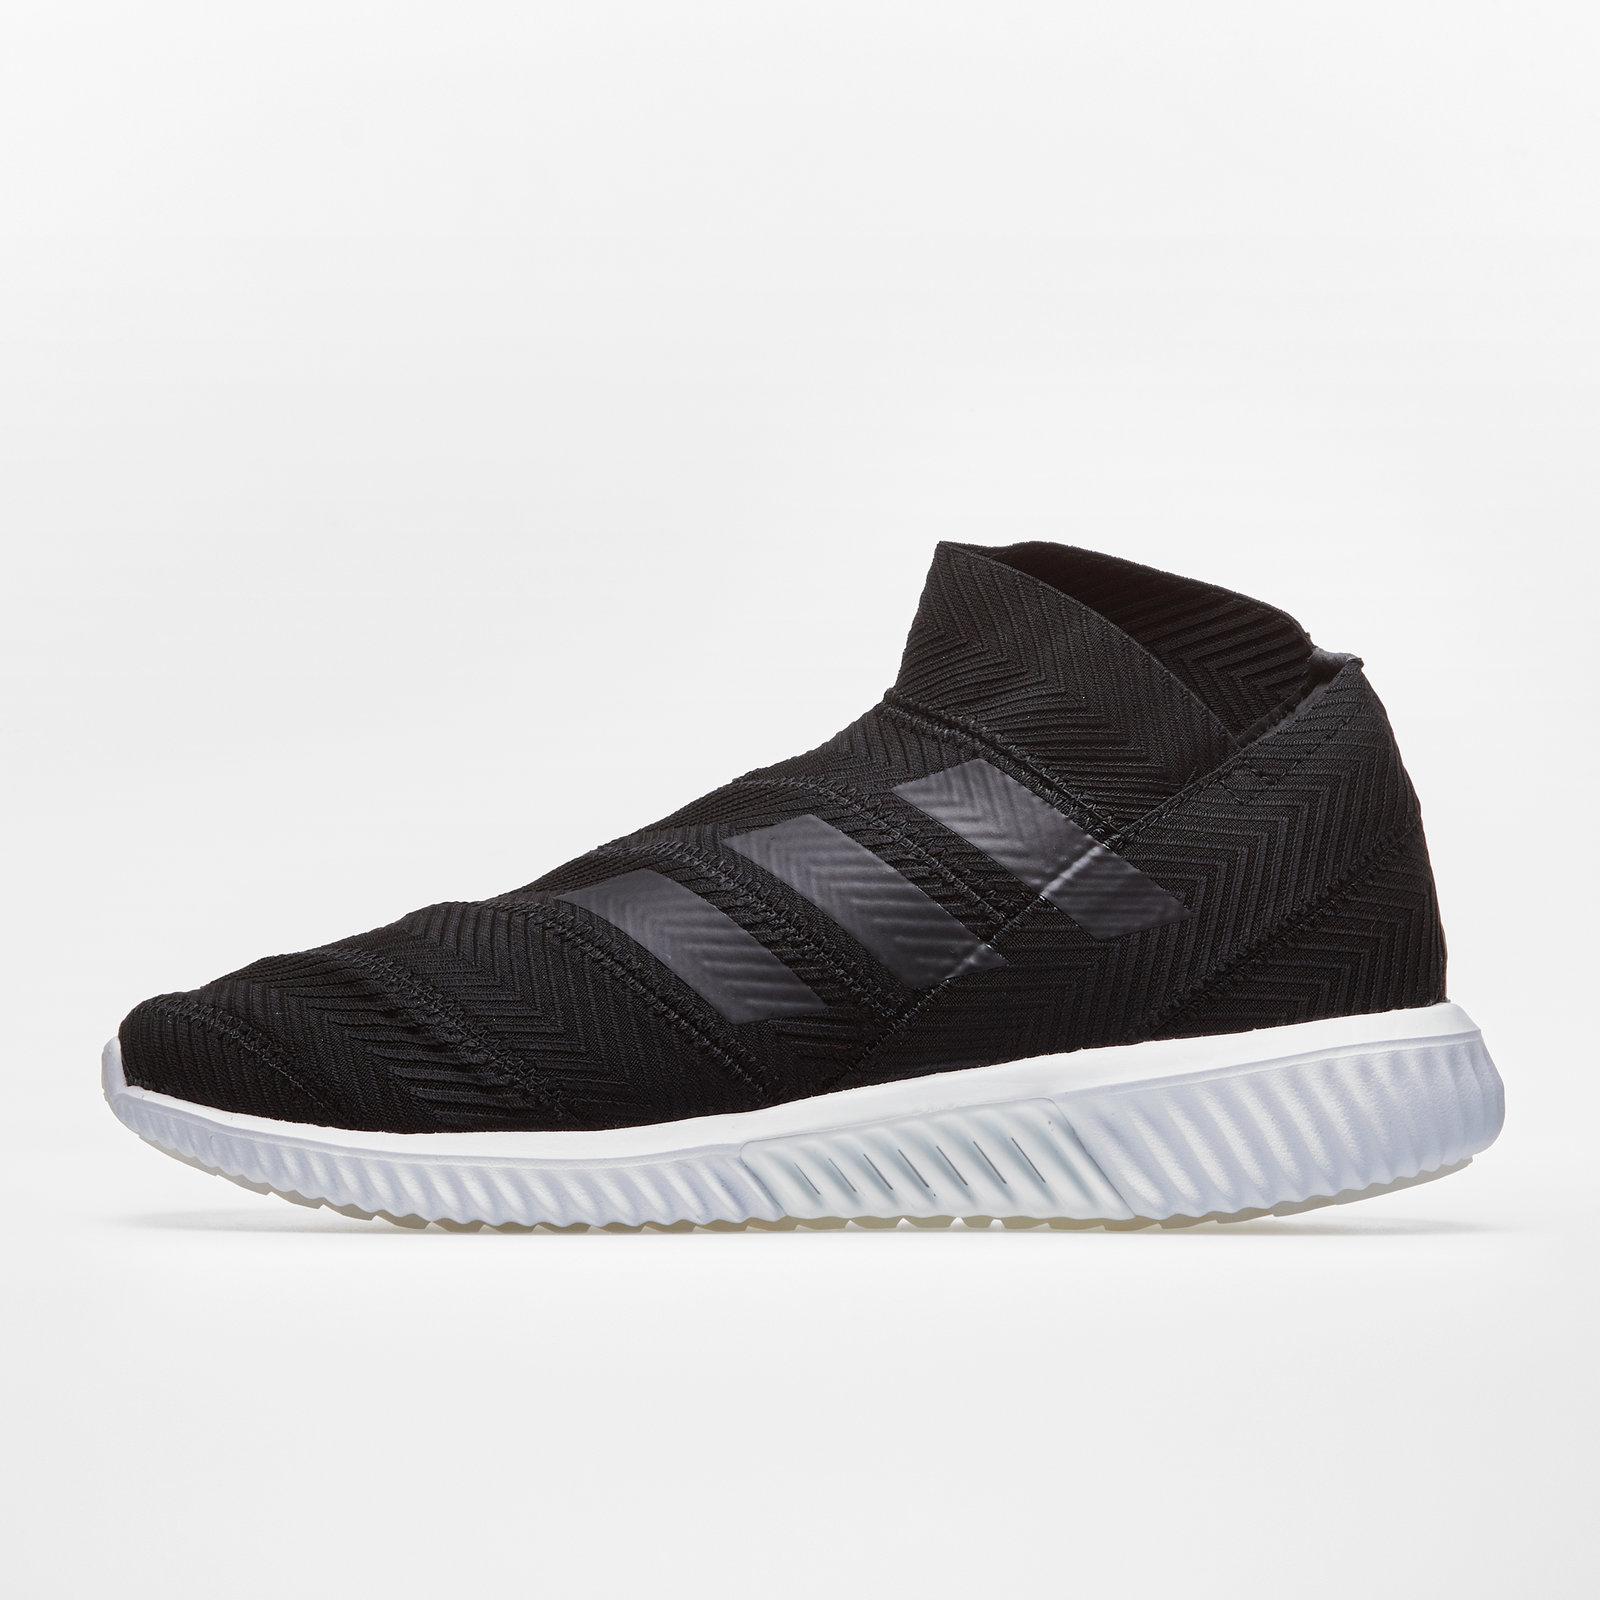 5d734177379 adidas Mens Nemeziz Tango 18.1 Football Boots Studs Trainers Sports Shoes  Black